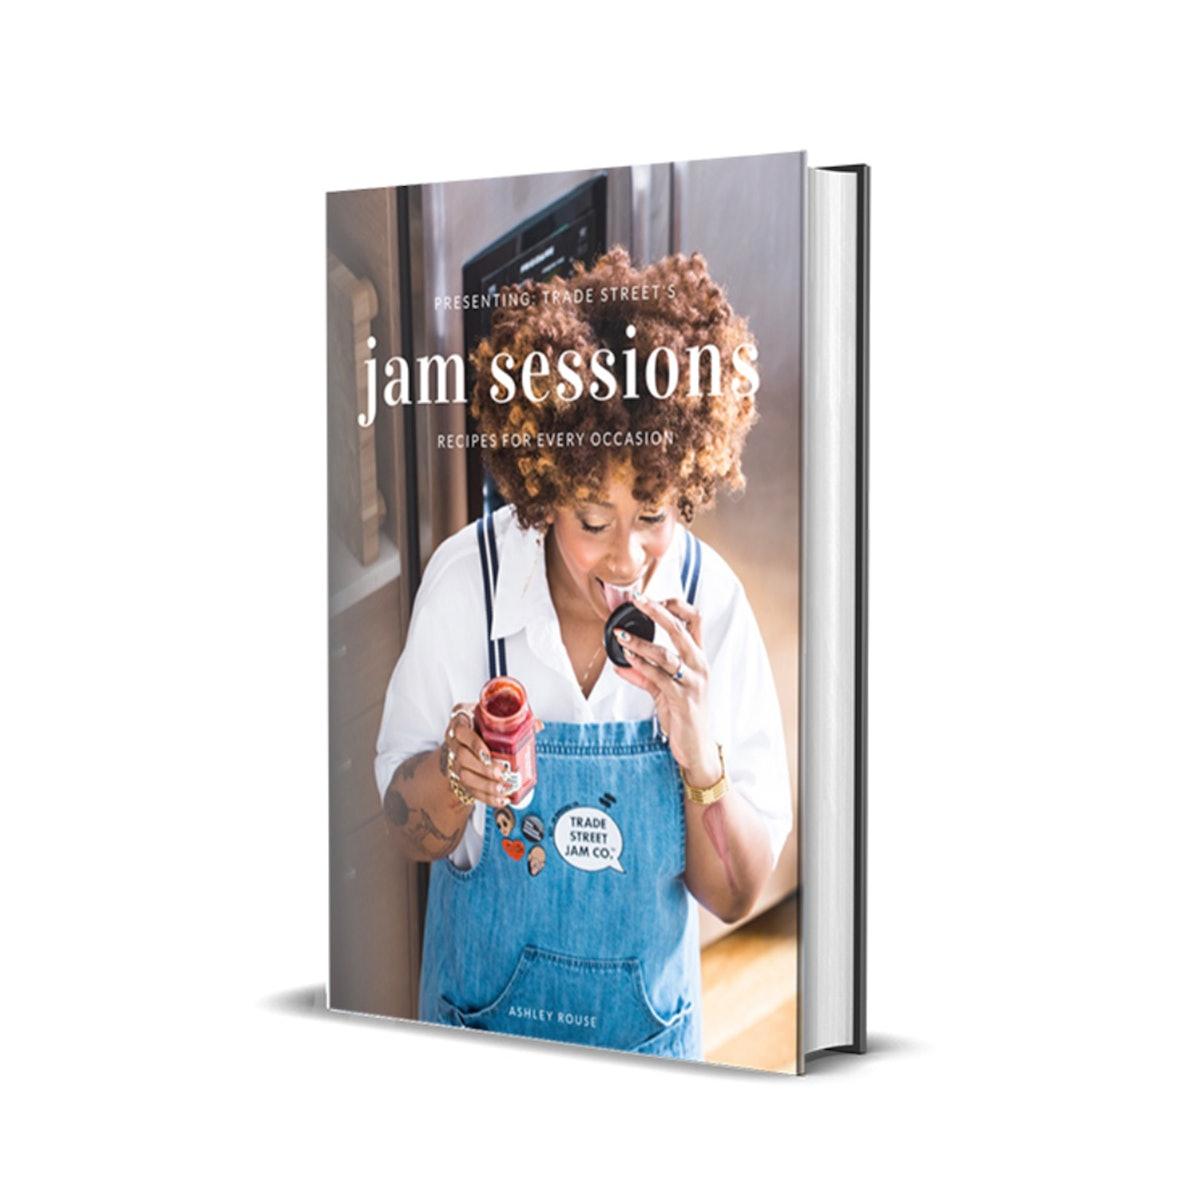 'Jam Sessions' Cookbook Digital Download by Trade Street Jam Co.